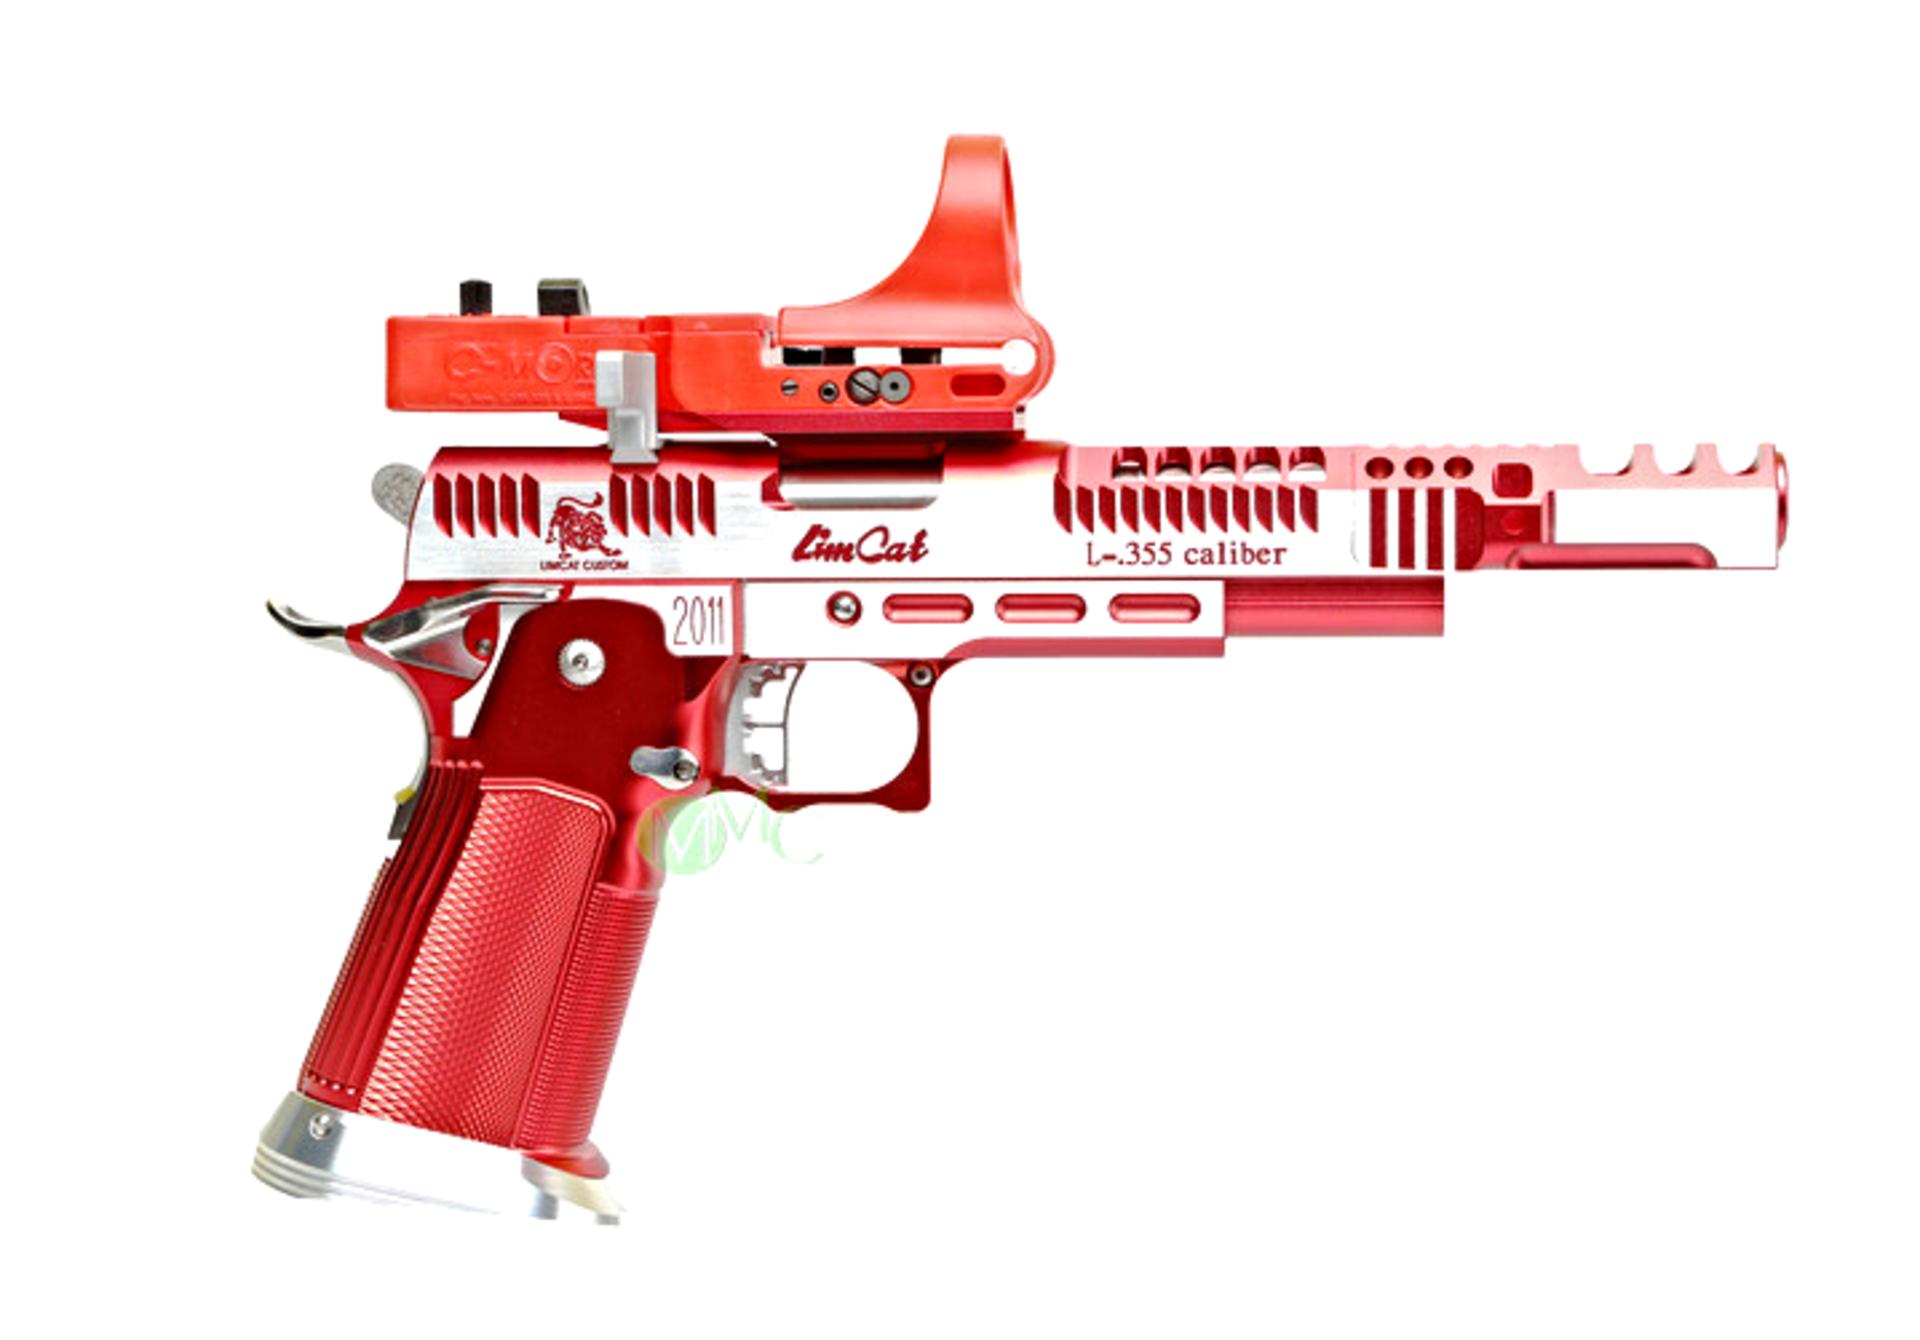 MMC custom Limcat RazorCat Open race pistol with C-More